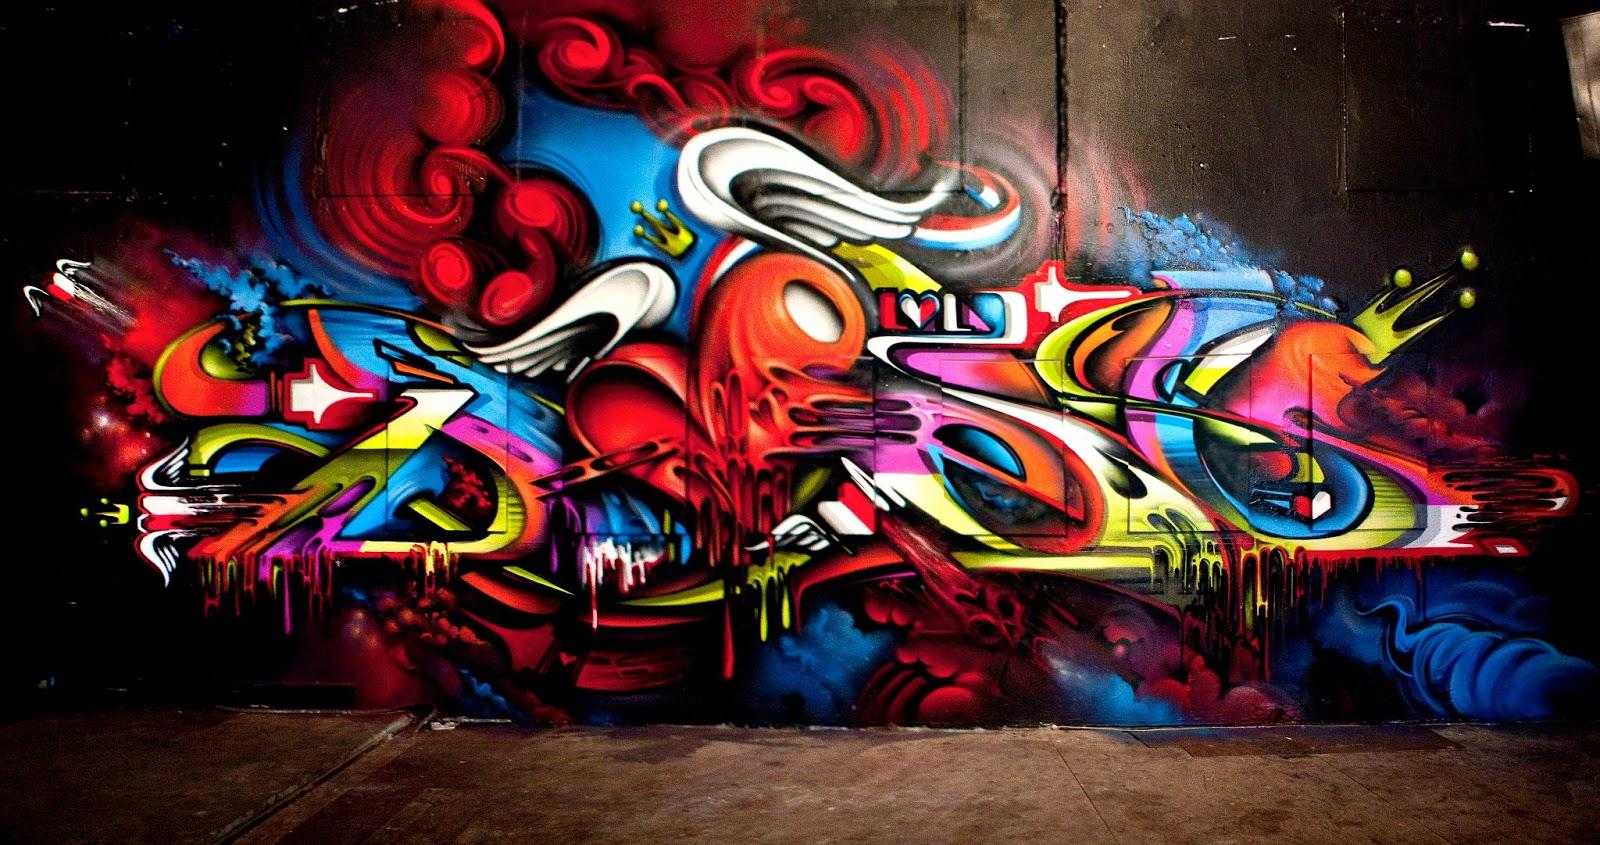 Graffiti Wallpaper Desktop 3d Posted By Ethan Simpson